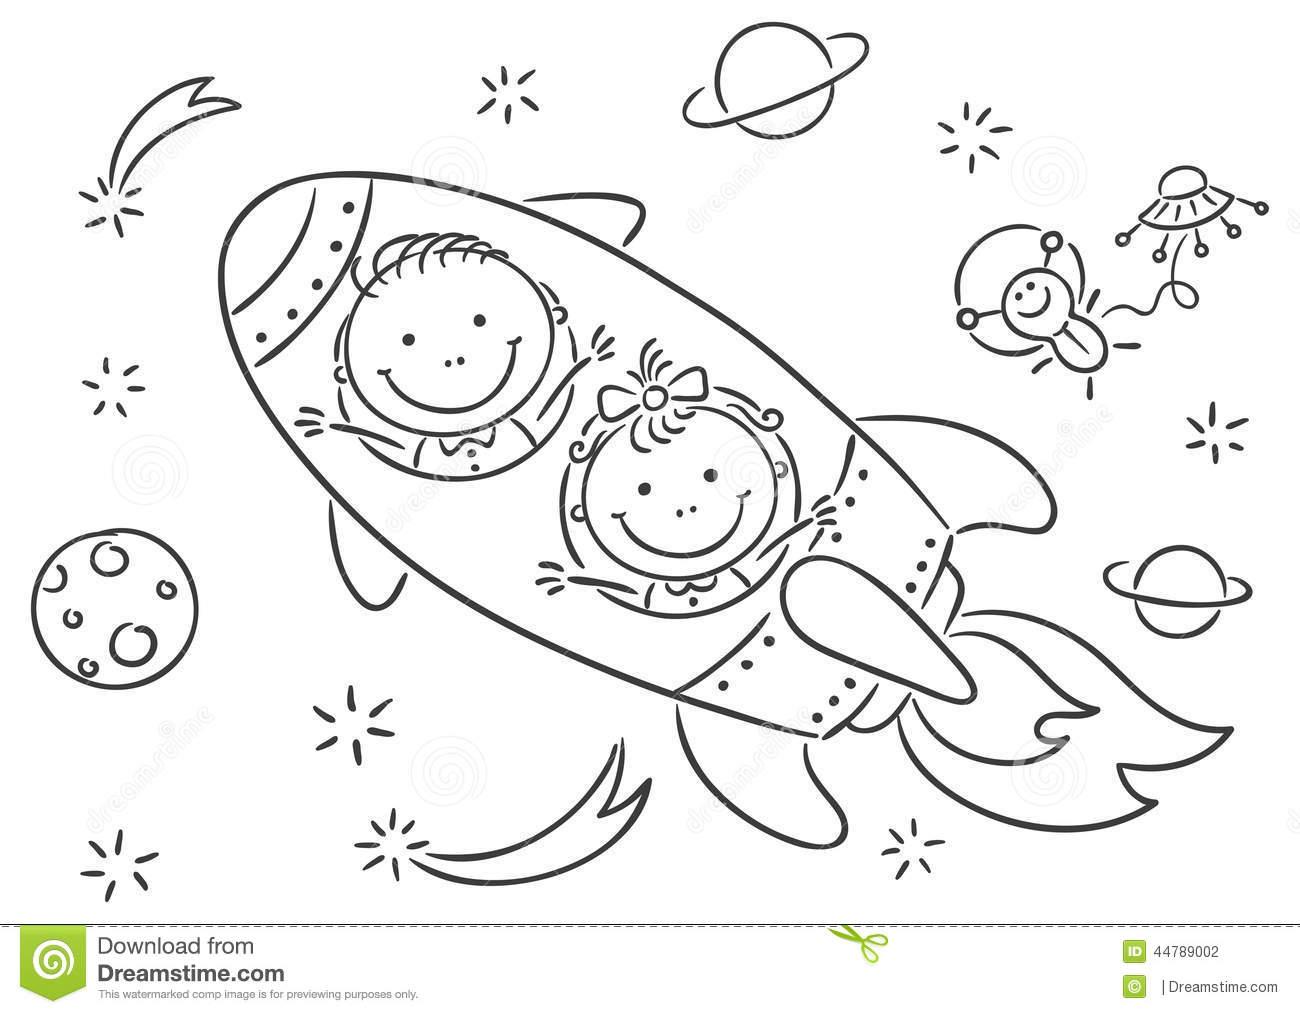 Space Drawing At Getdrawings